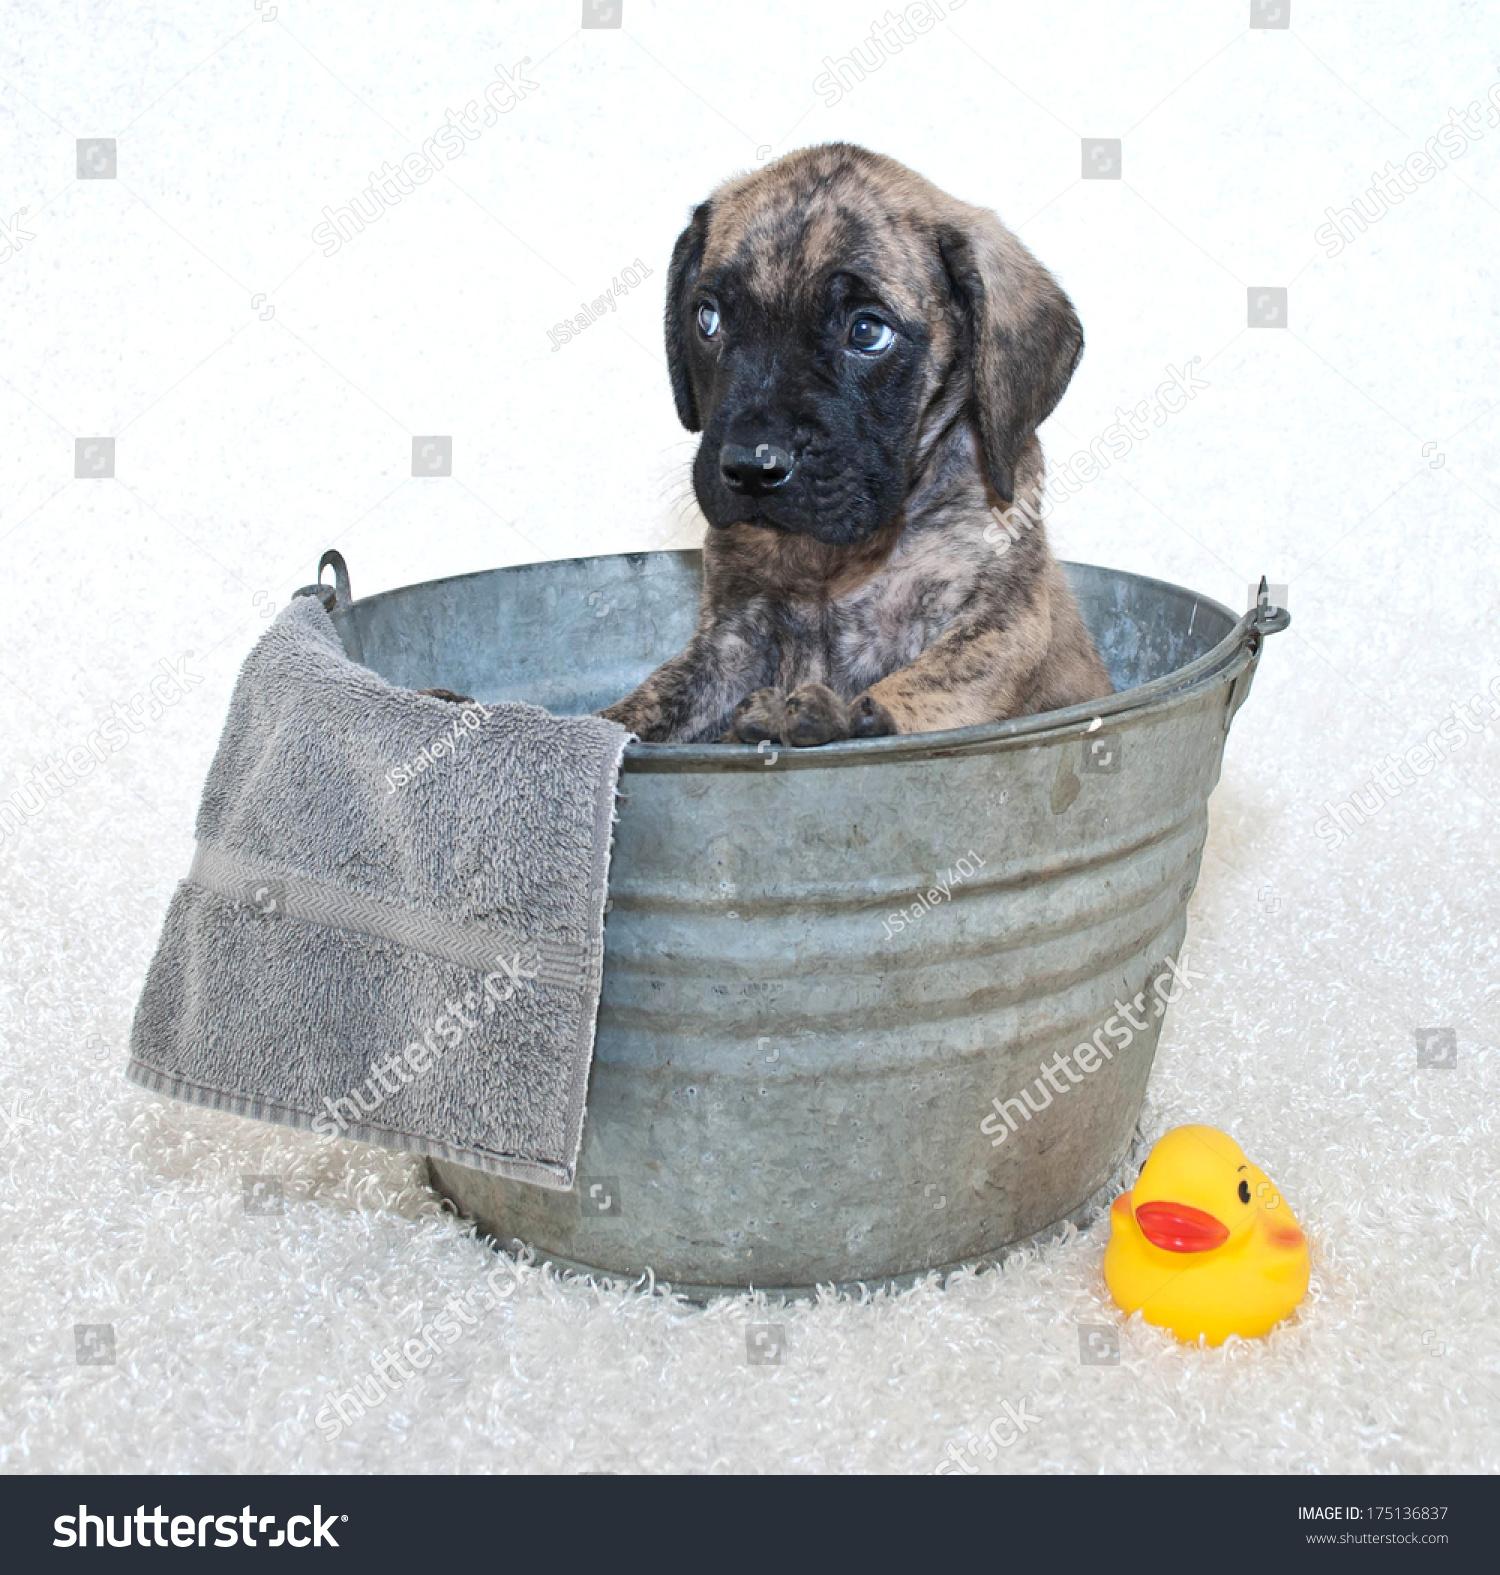 A Mastiff Puppy Giving A Sad Look While Sitting In A Bath